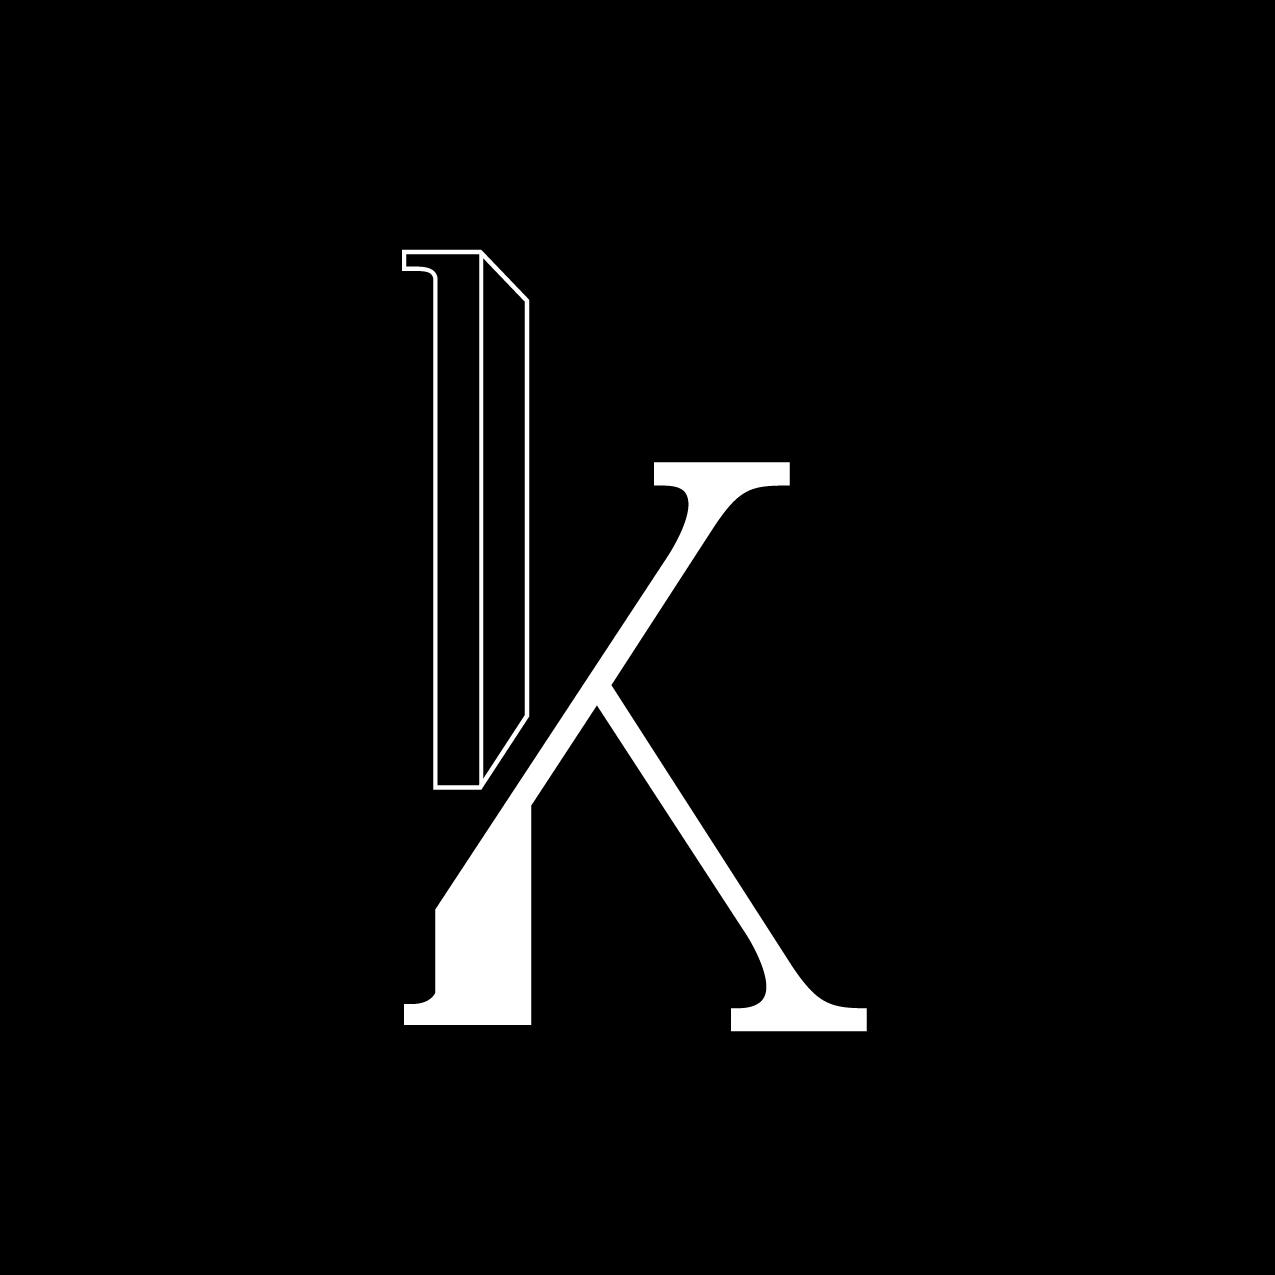 Letter K3 Design by Furia